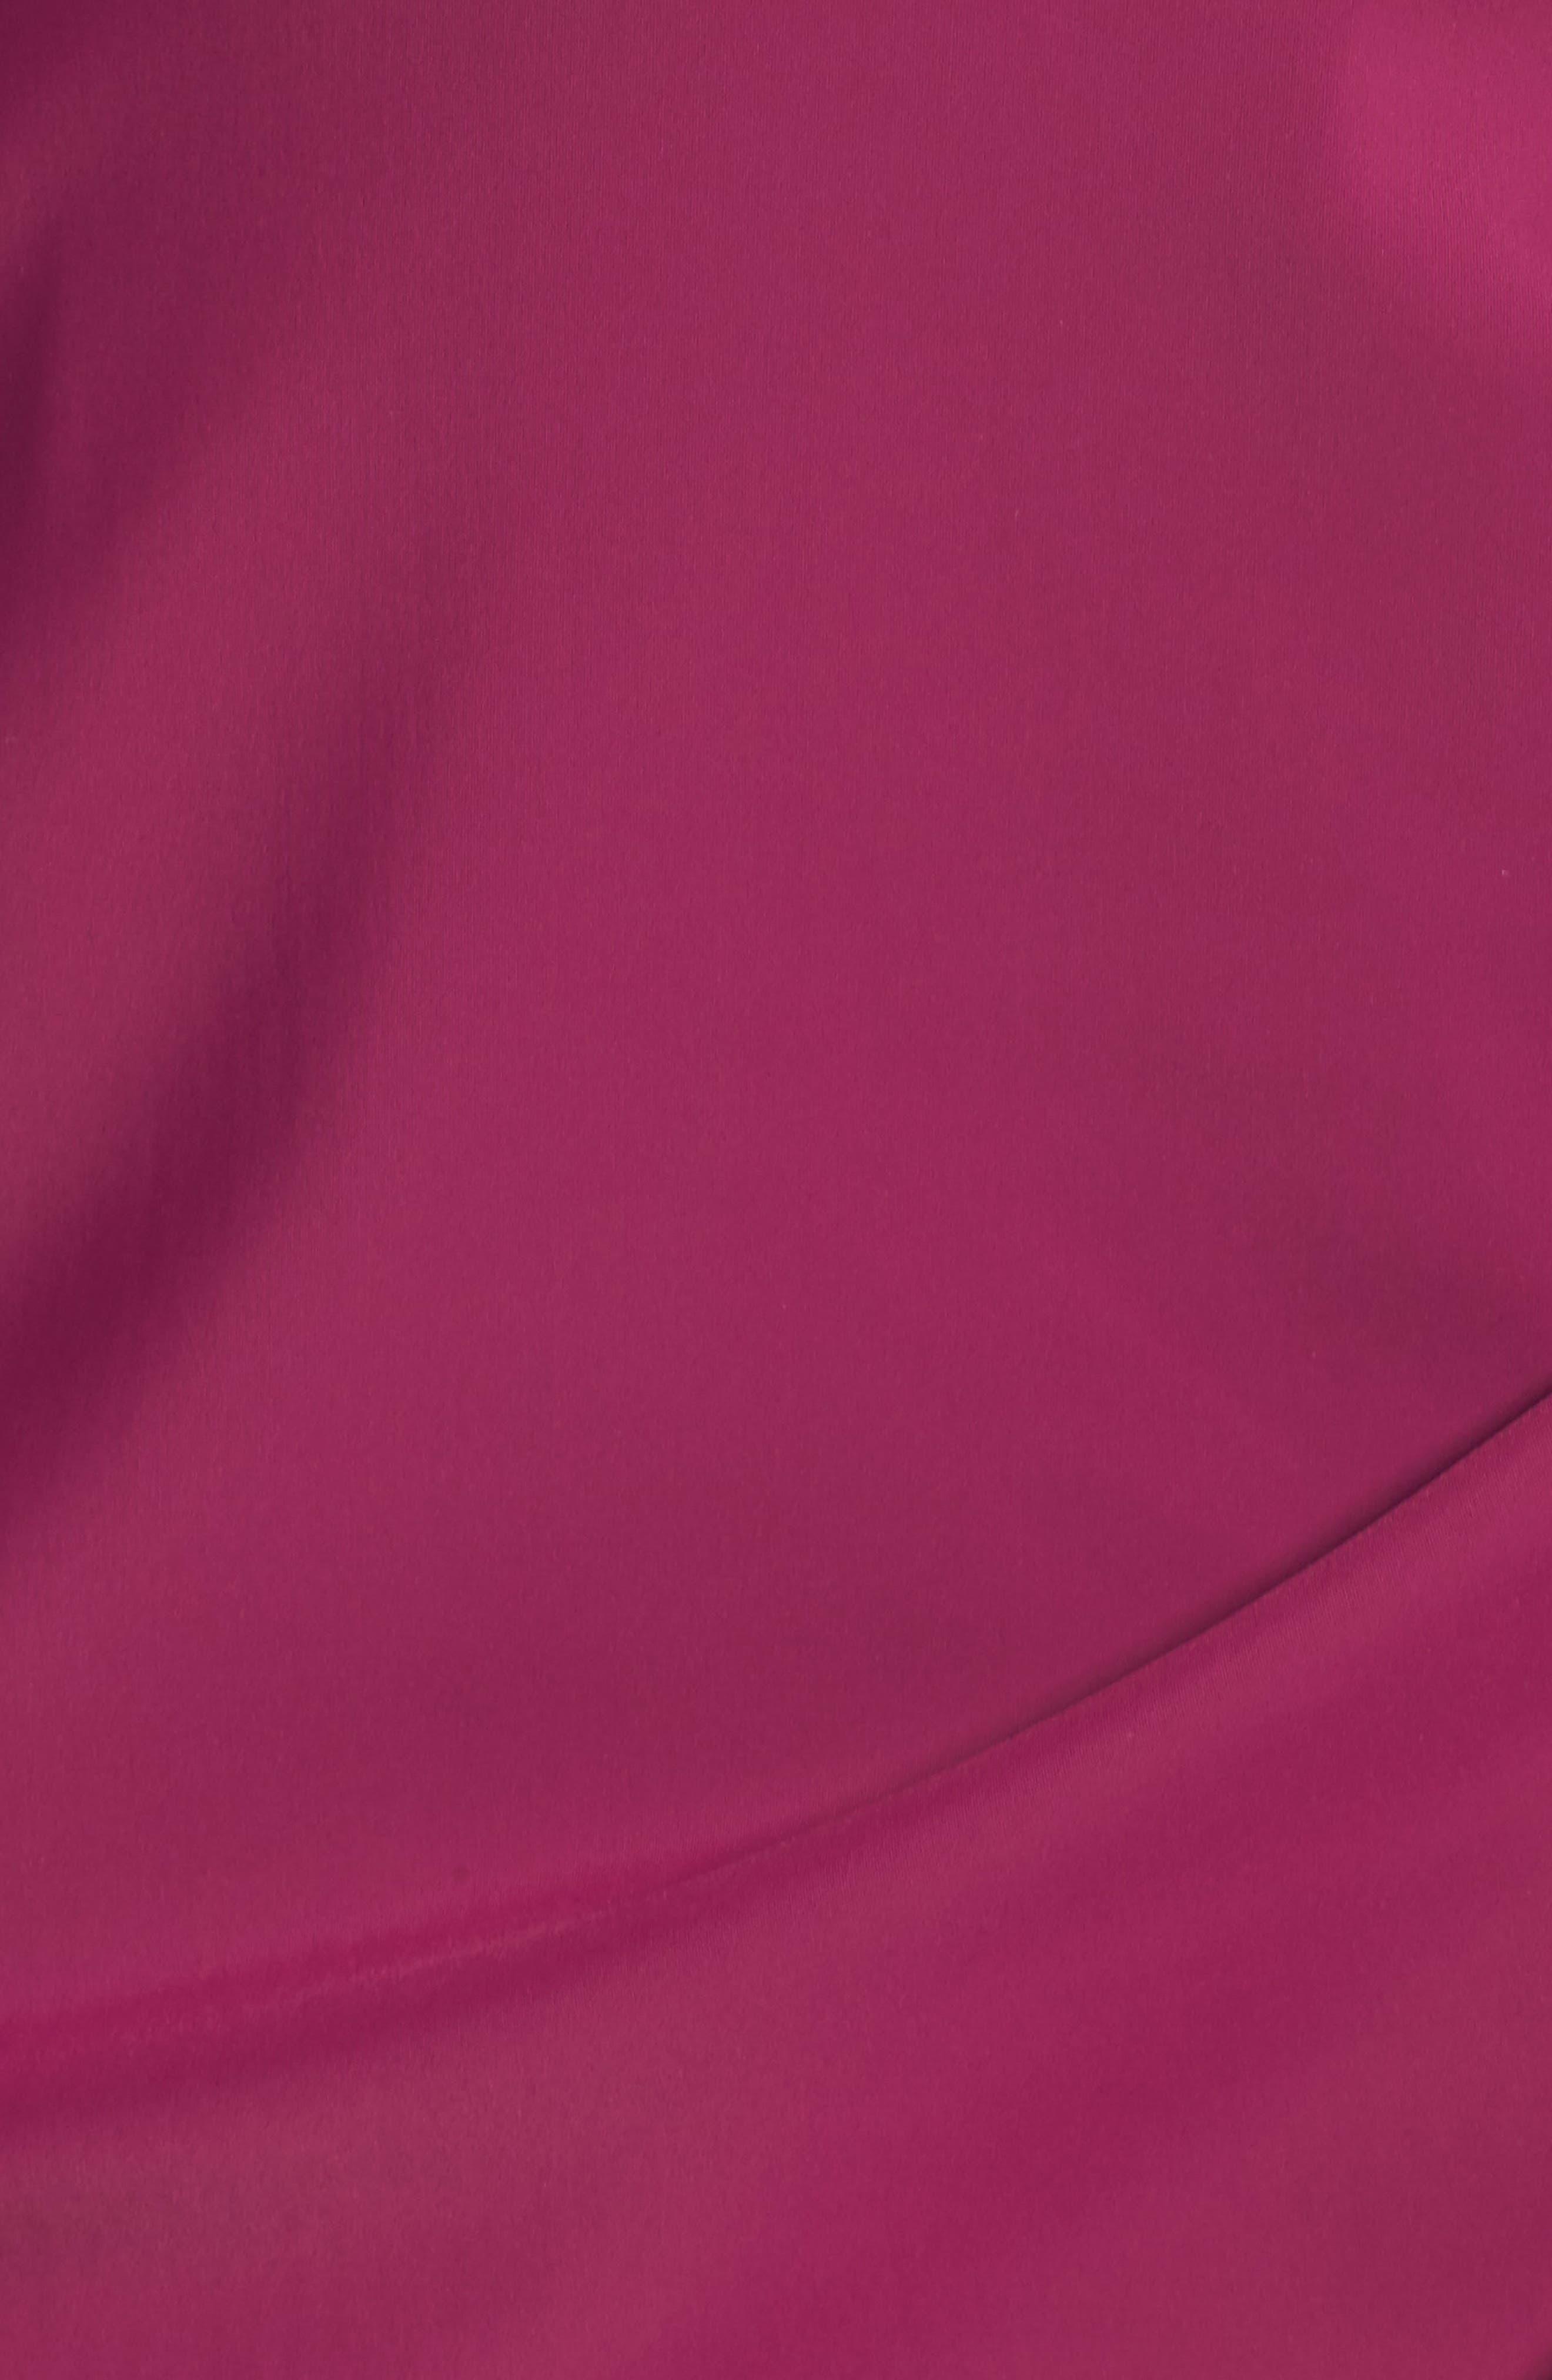 Embellished Surplice Sheath Dress,                             Alternate thumbnail 35, color,